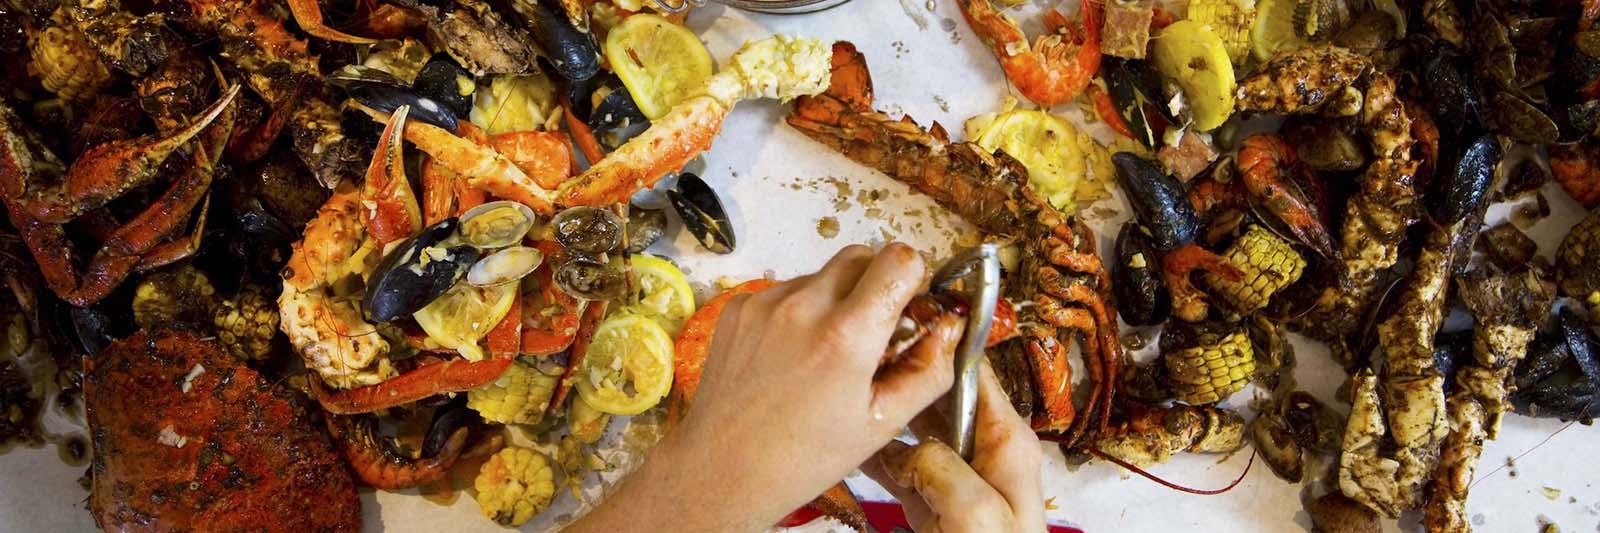 pescetarian blog sydney